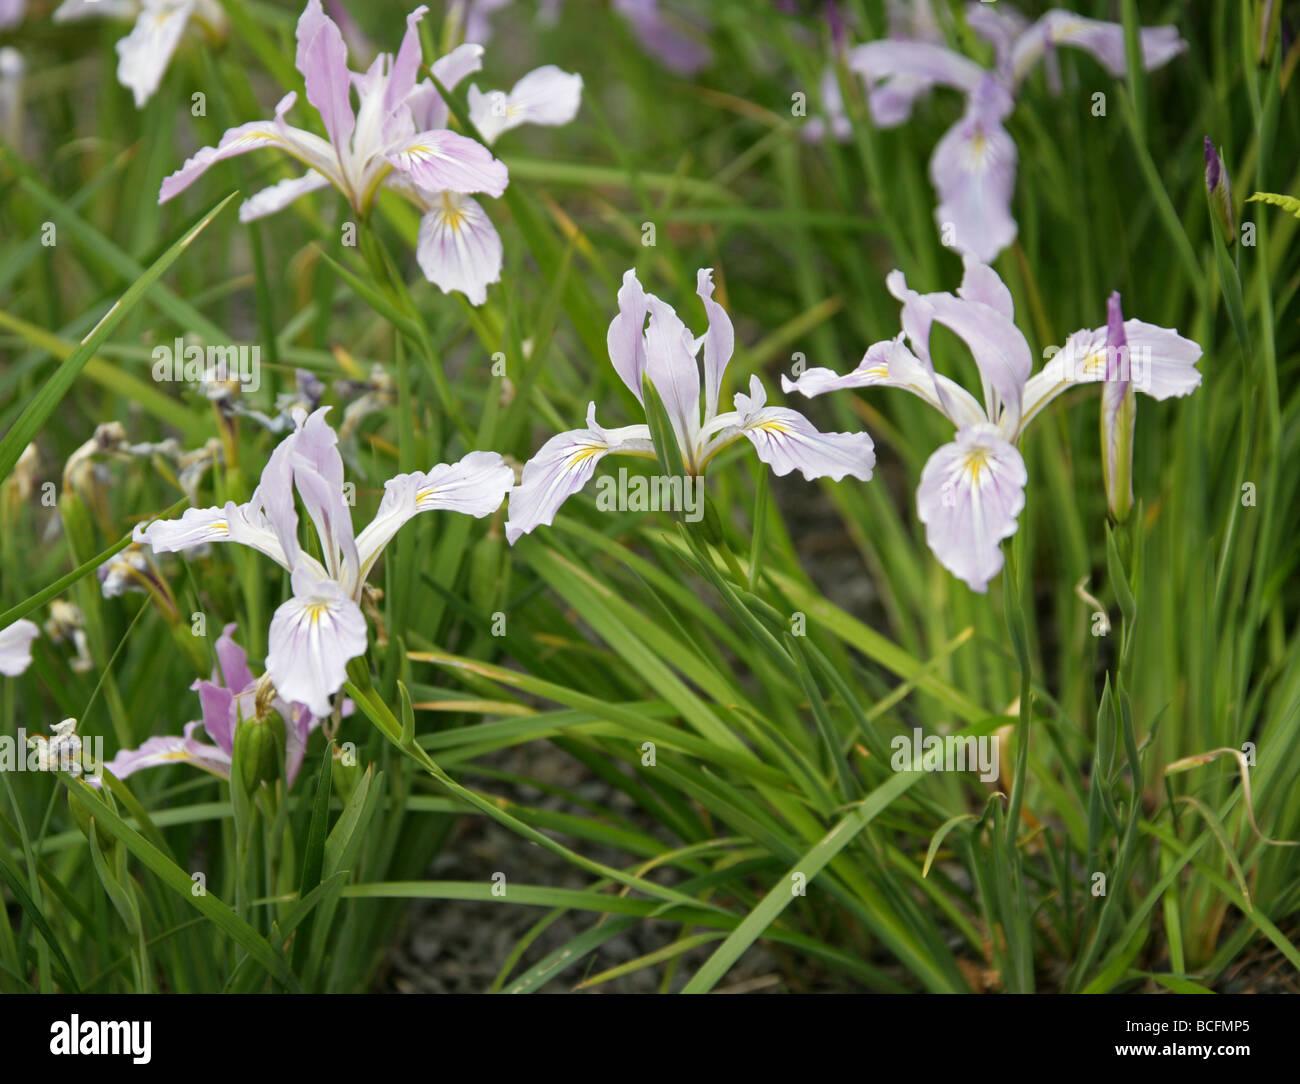 Tough-leaved Iris or Oregon Iris, Iris tenax, Iridaceae, Oregon, Washington, USA, North America. - Stock Image